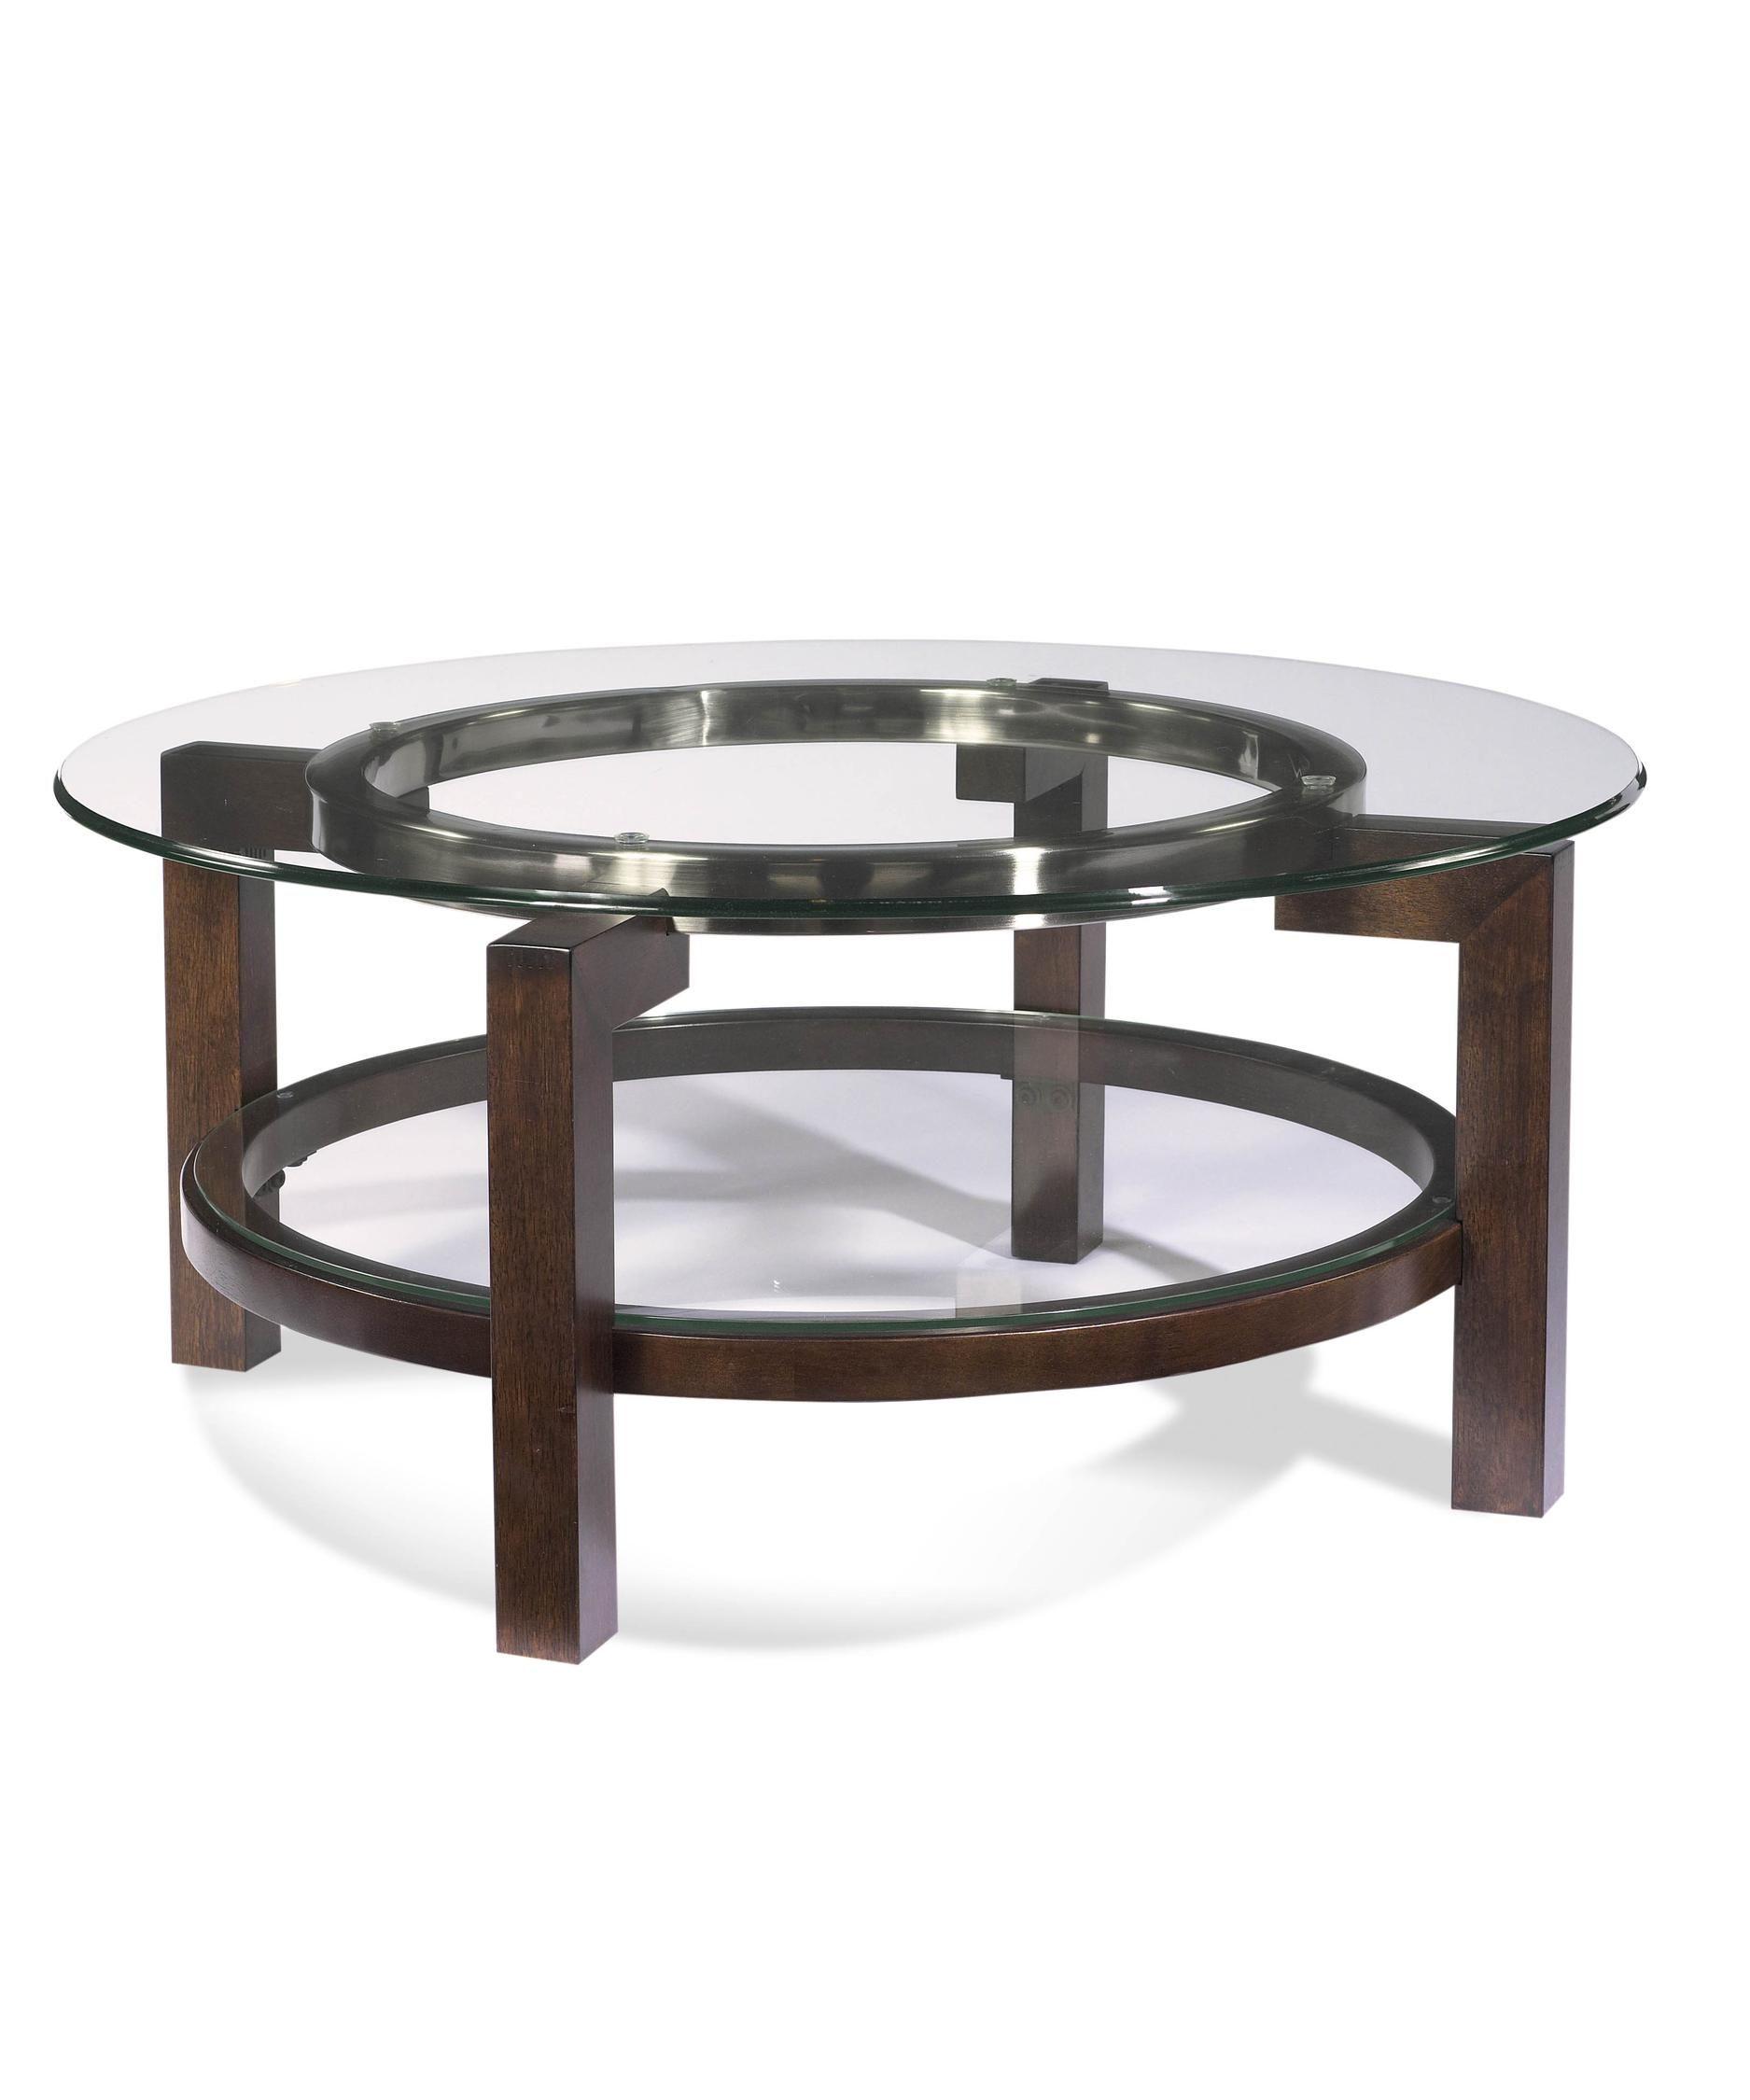 Bassett Mirror pany T1705 120 Oslo Coffee Table